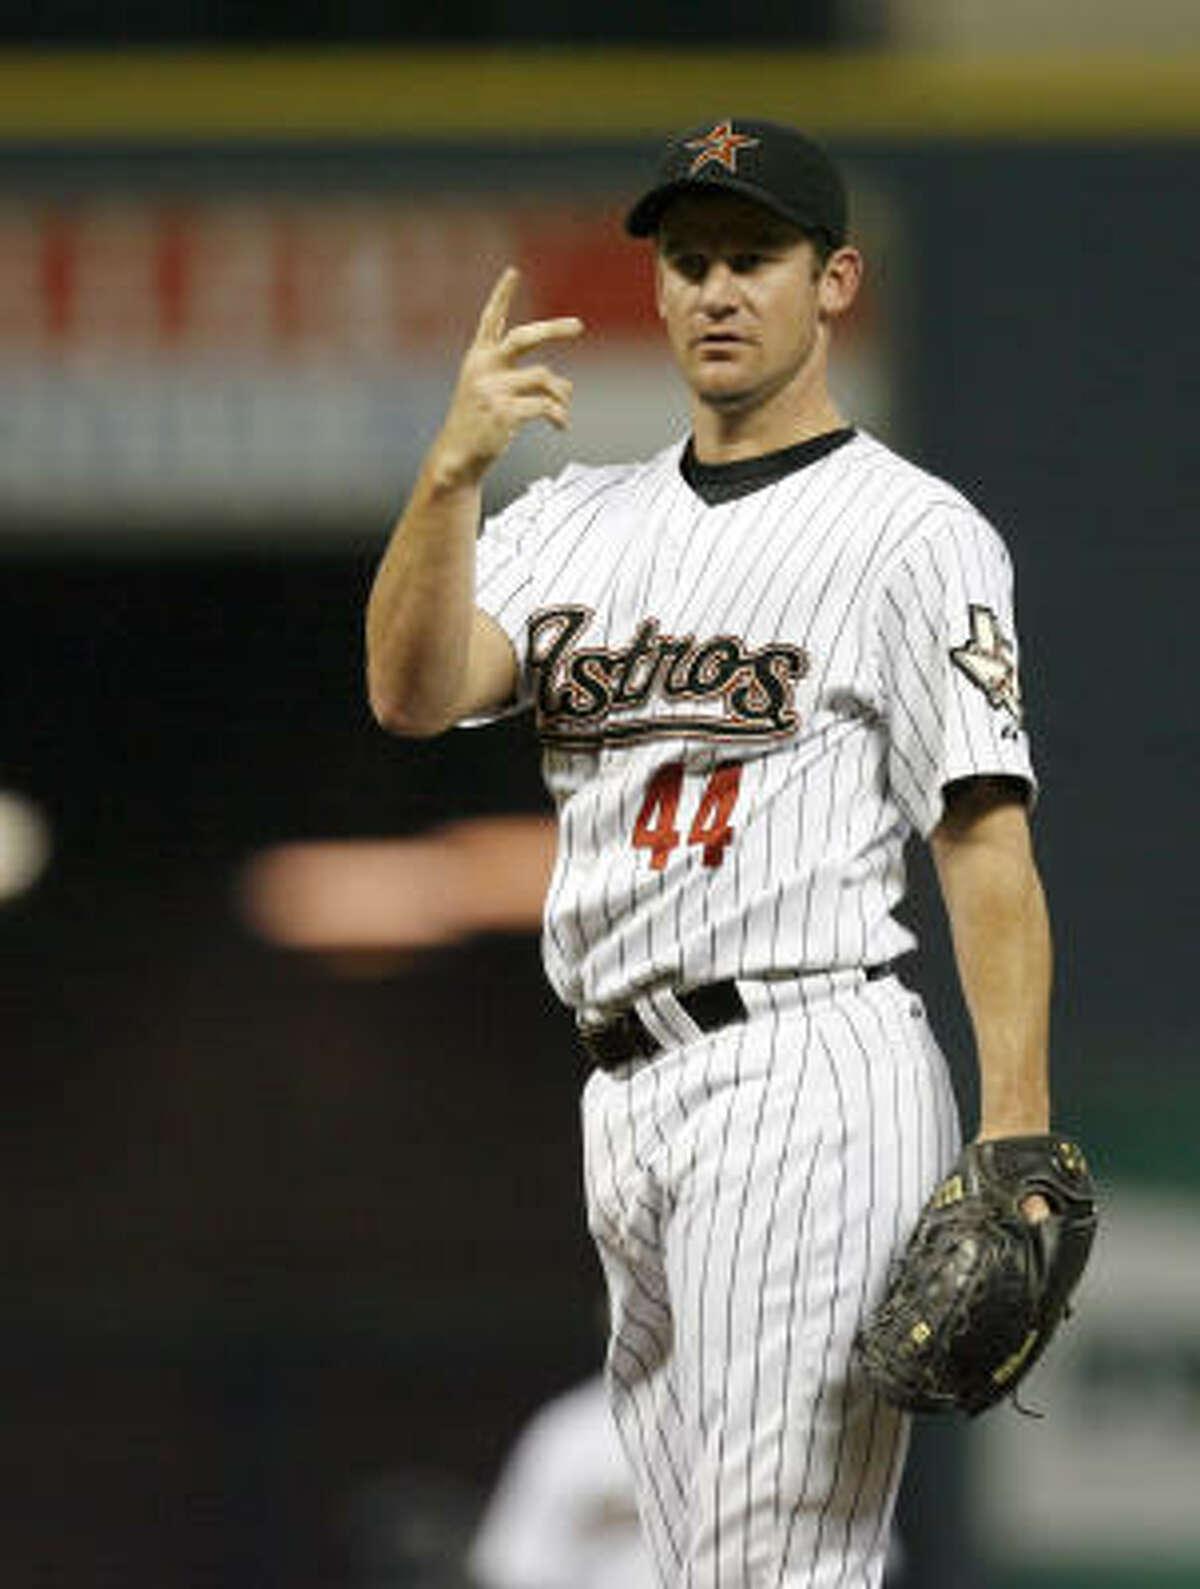 Roy Oswalt, RHP 2009 stats: 8-6, 4.12 ERA, 181 1/3 IP